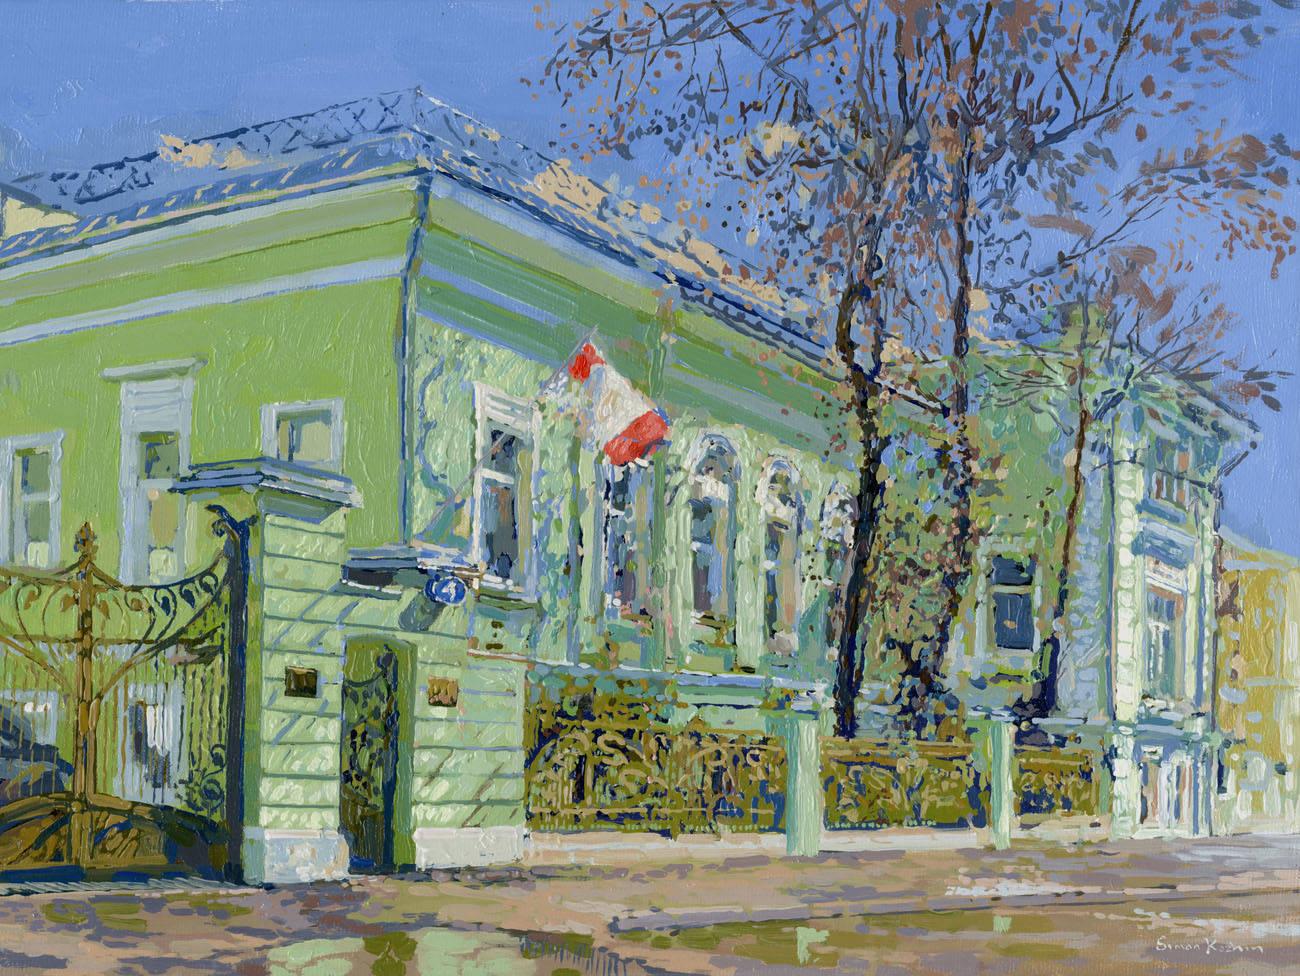 Dmitry Nikolayevich Begichev's estate. Starokonyushenny lane the house 4. 2011. Canvas on cardboard, oil. 25 x 35 cm